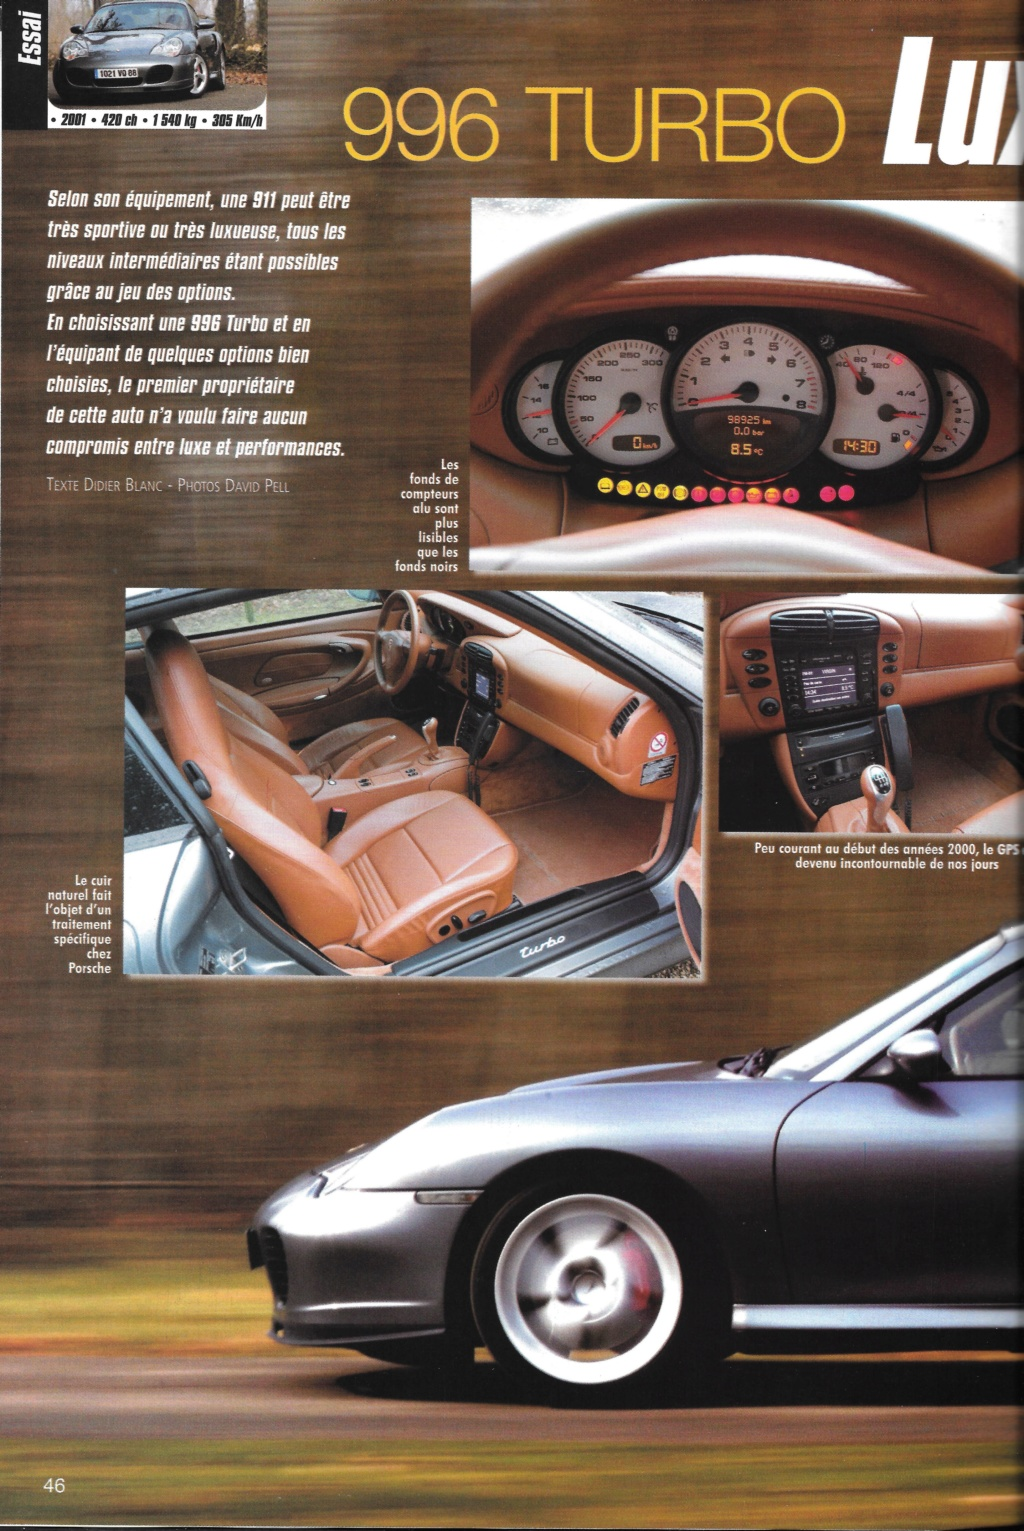 -VENDUE- Vente 996 Turbo 2001 Img_2610